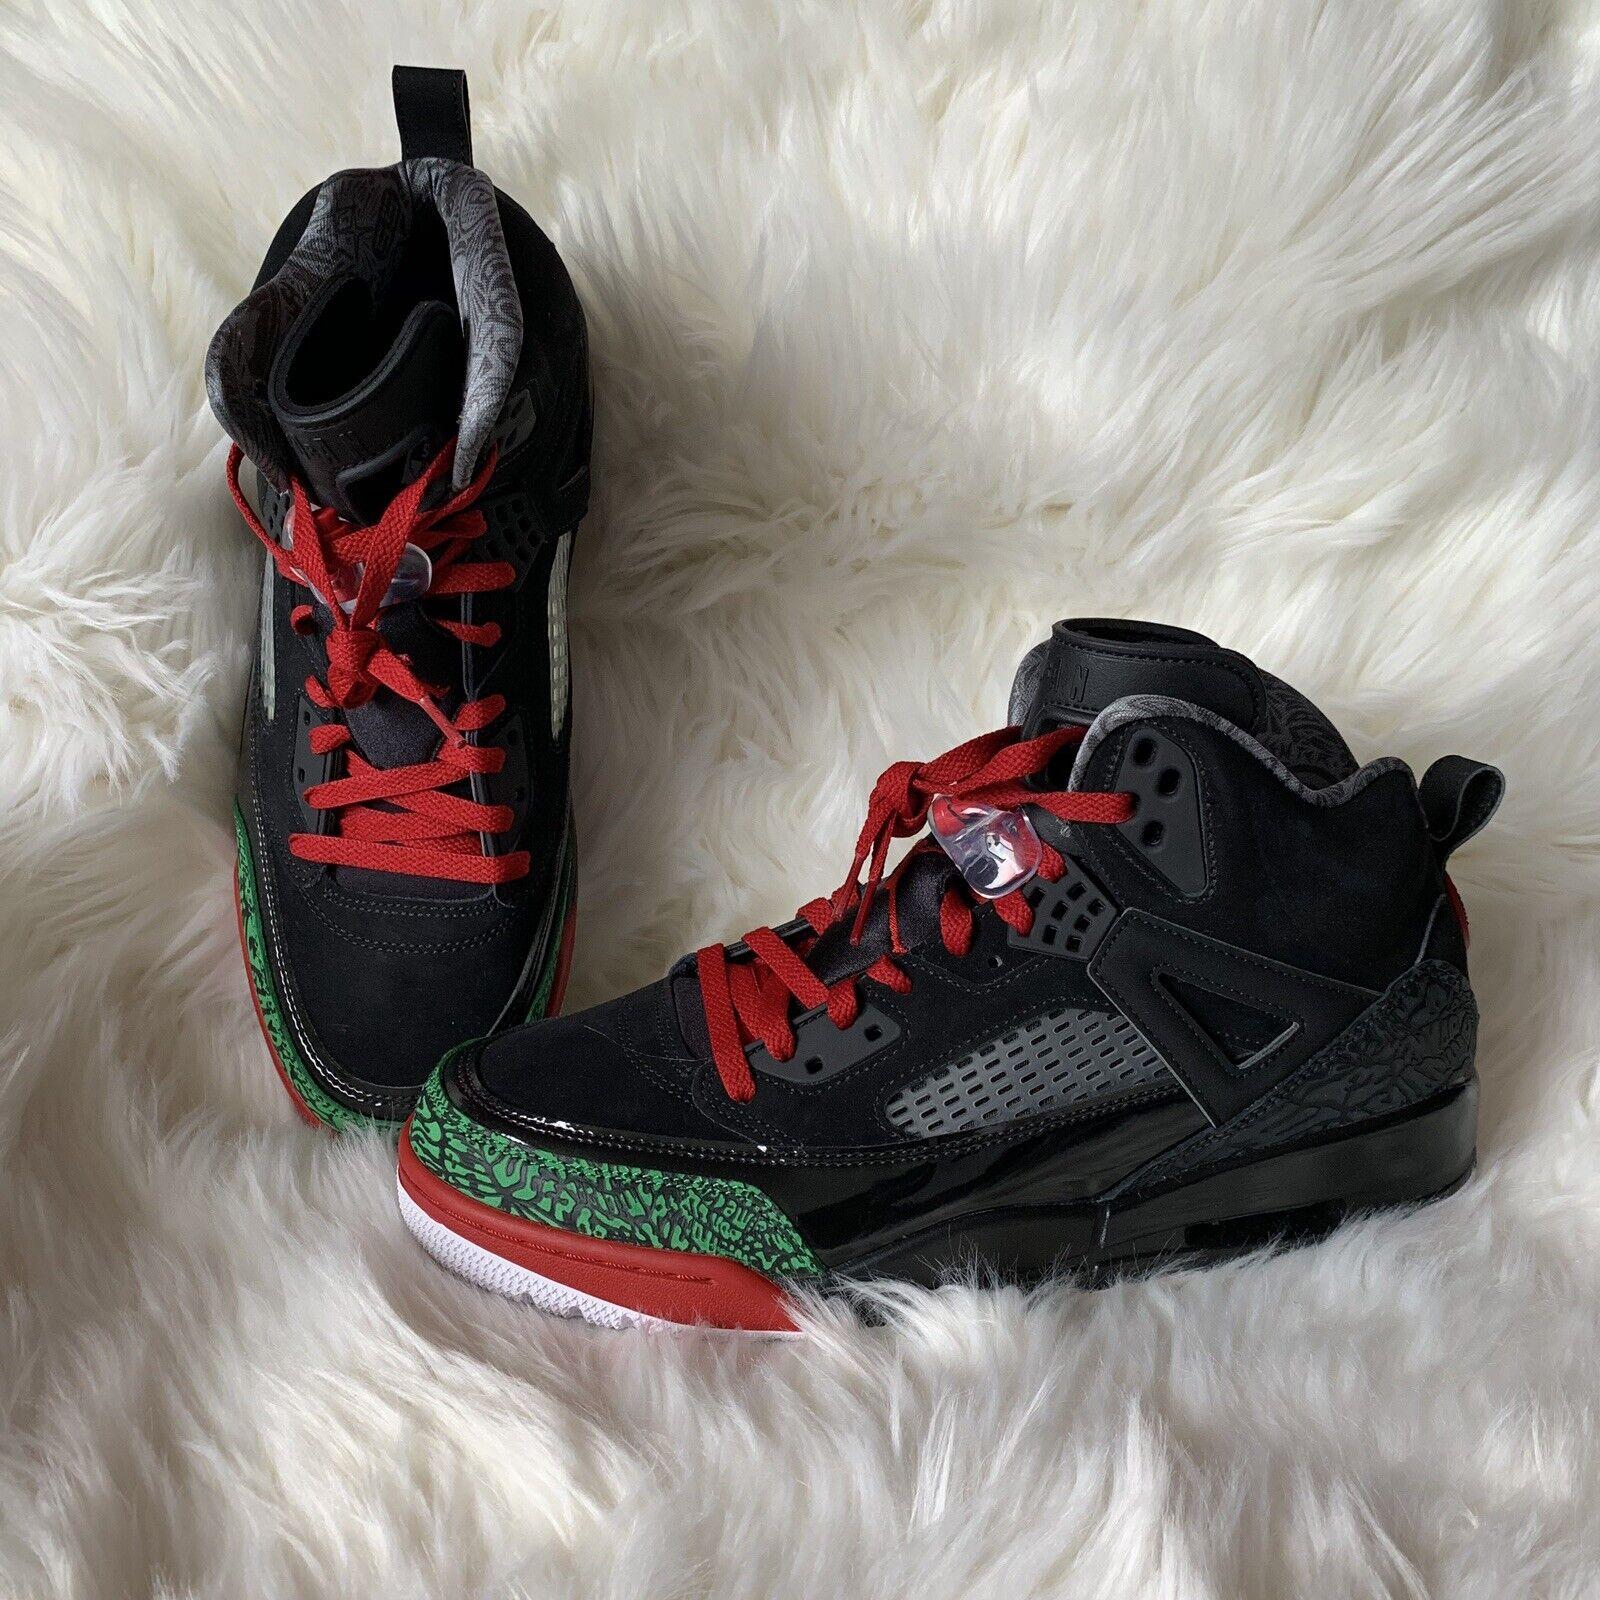 Air Jordan Spizike Retro nero Classic verde  Varsity rosso rosso rosso Uomo Dimensione 9 b5d76b